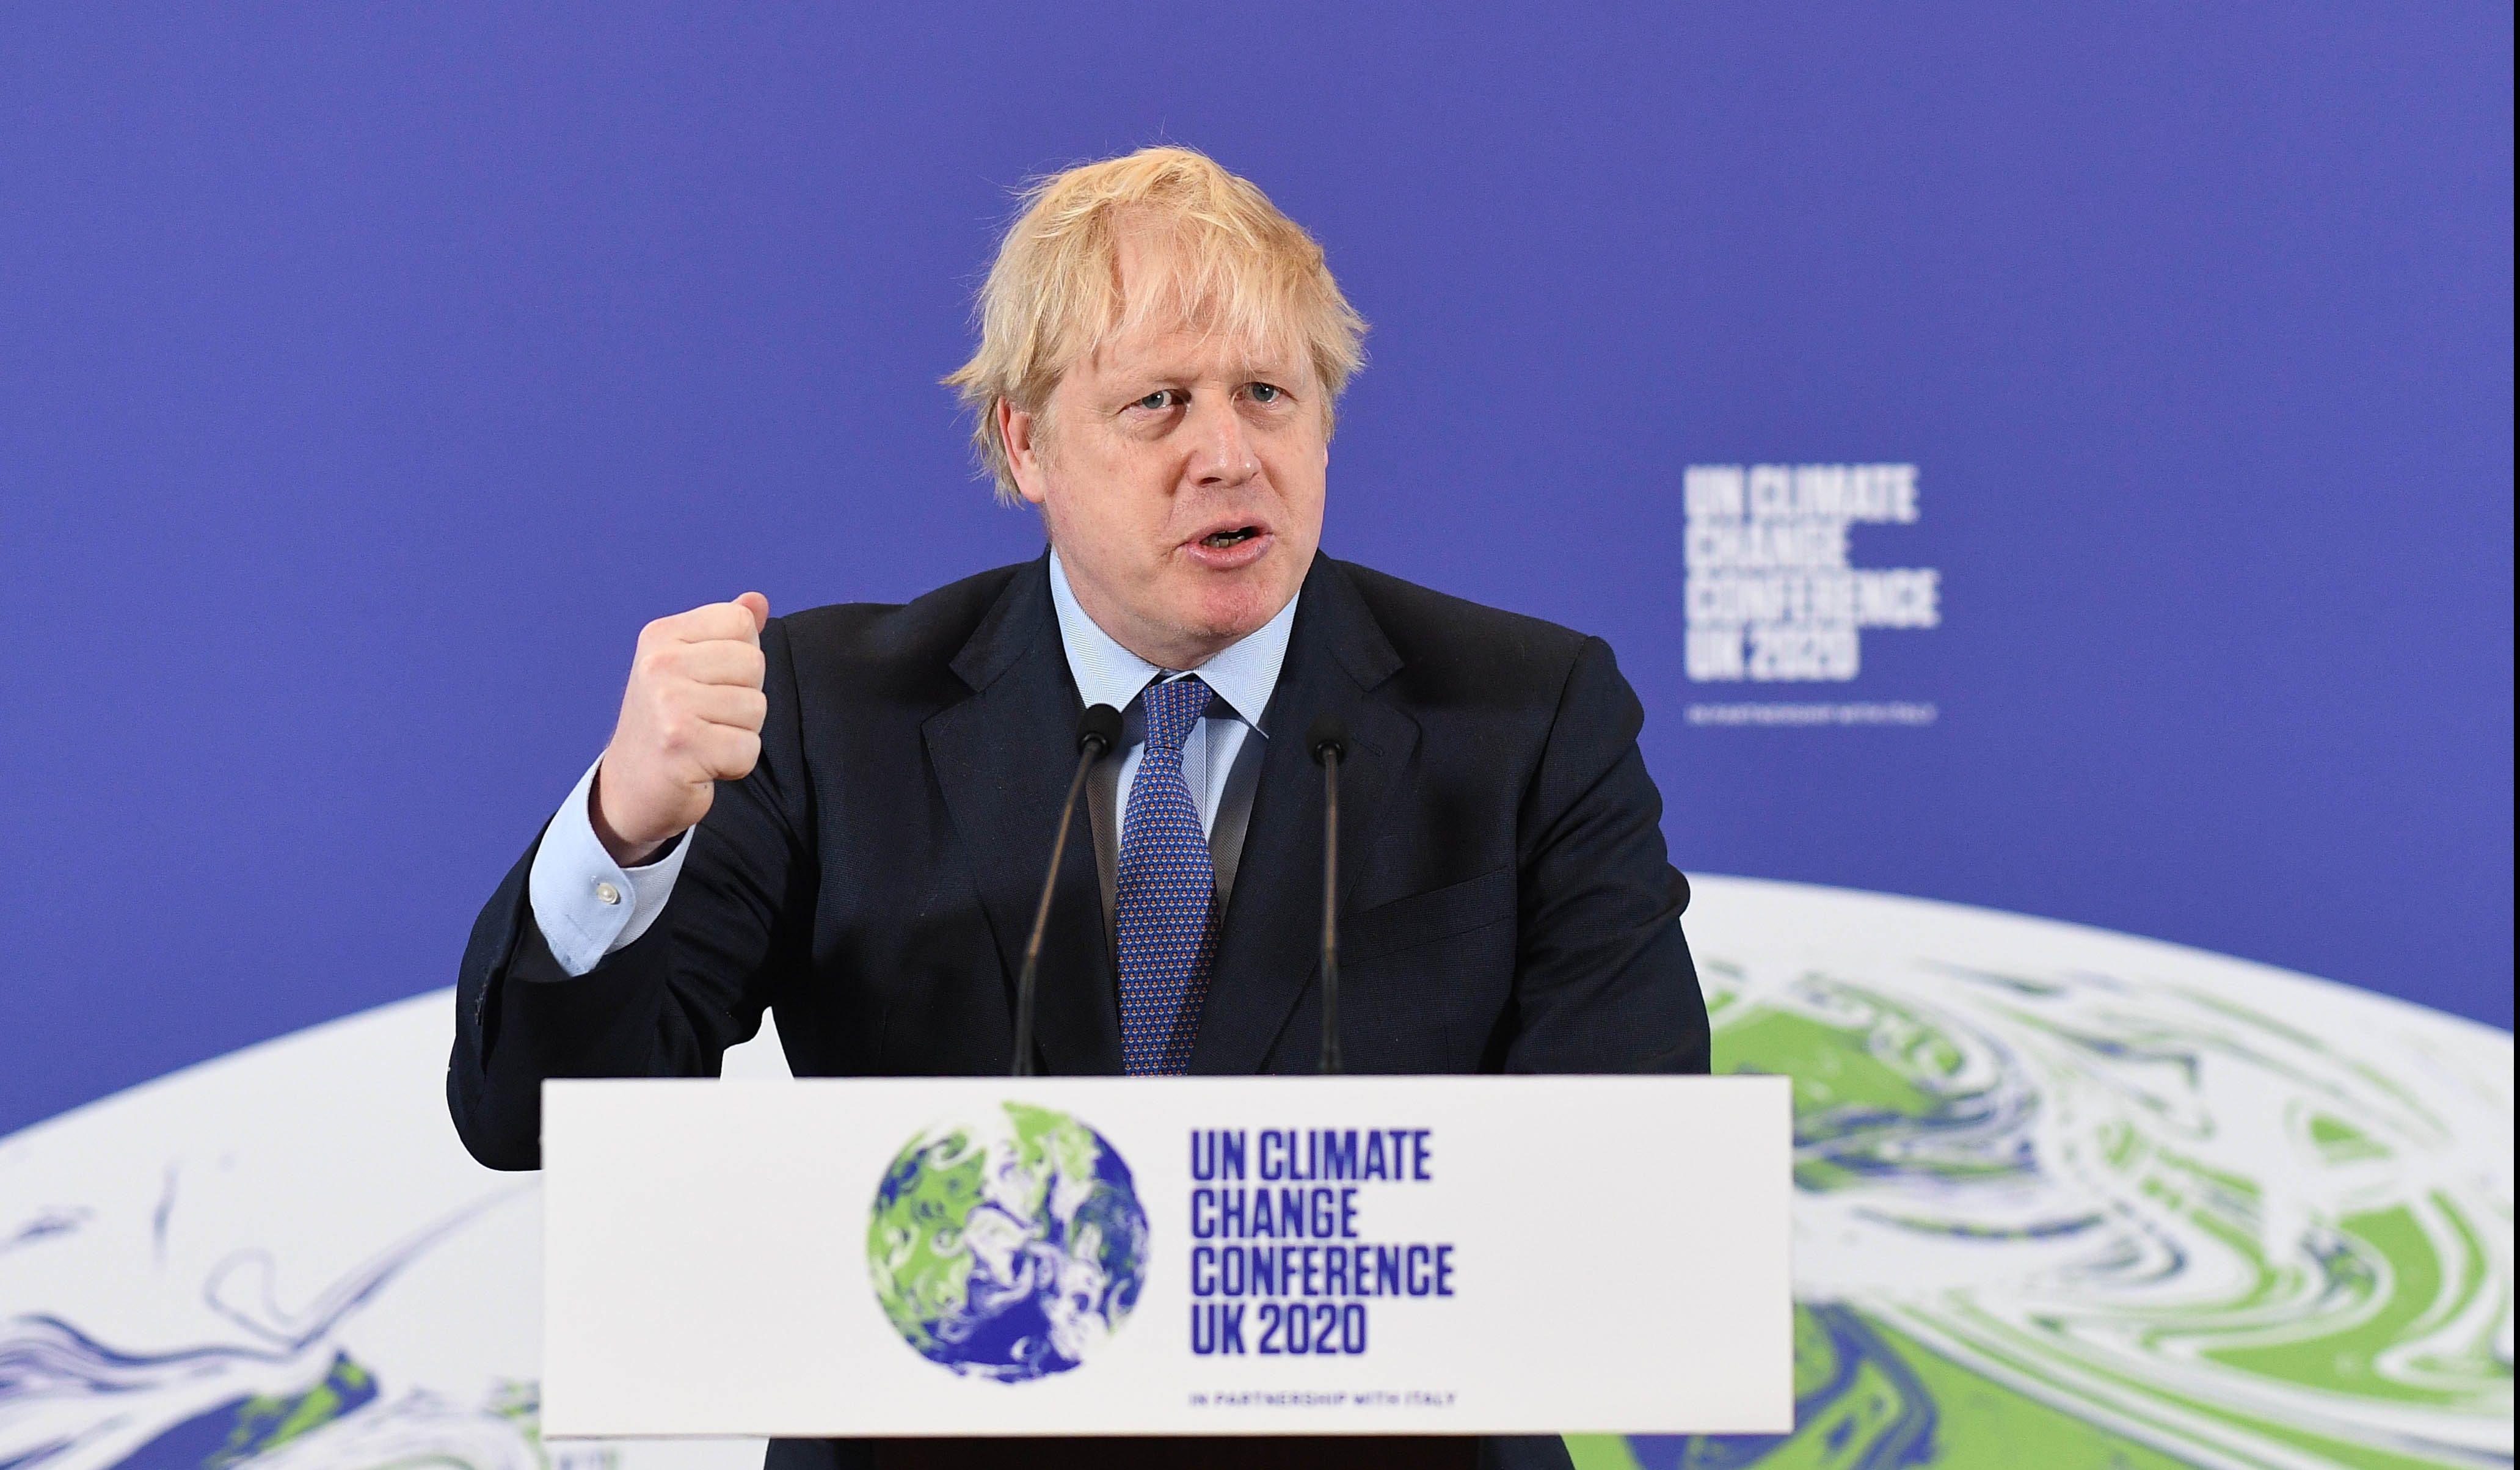 Net Zero Part 6: Can Net Zero Go Bad For Politicians? Keep An Eye On British PM Boris Johnson